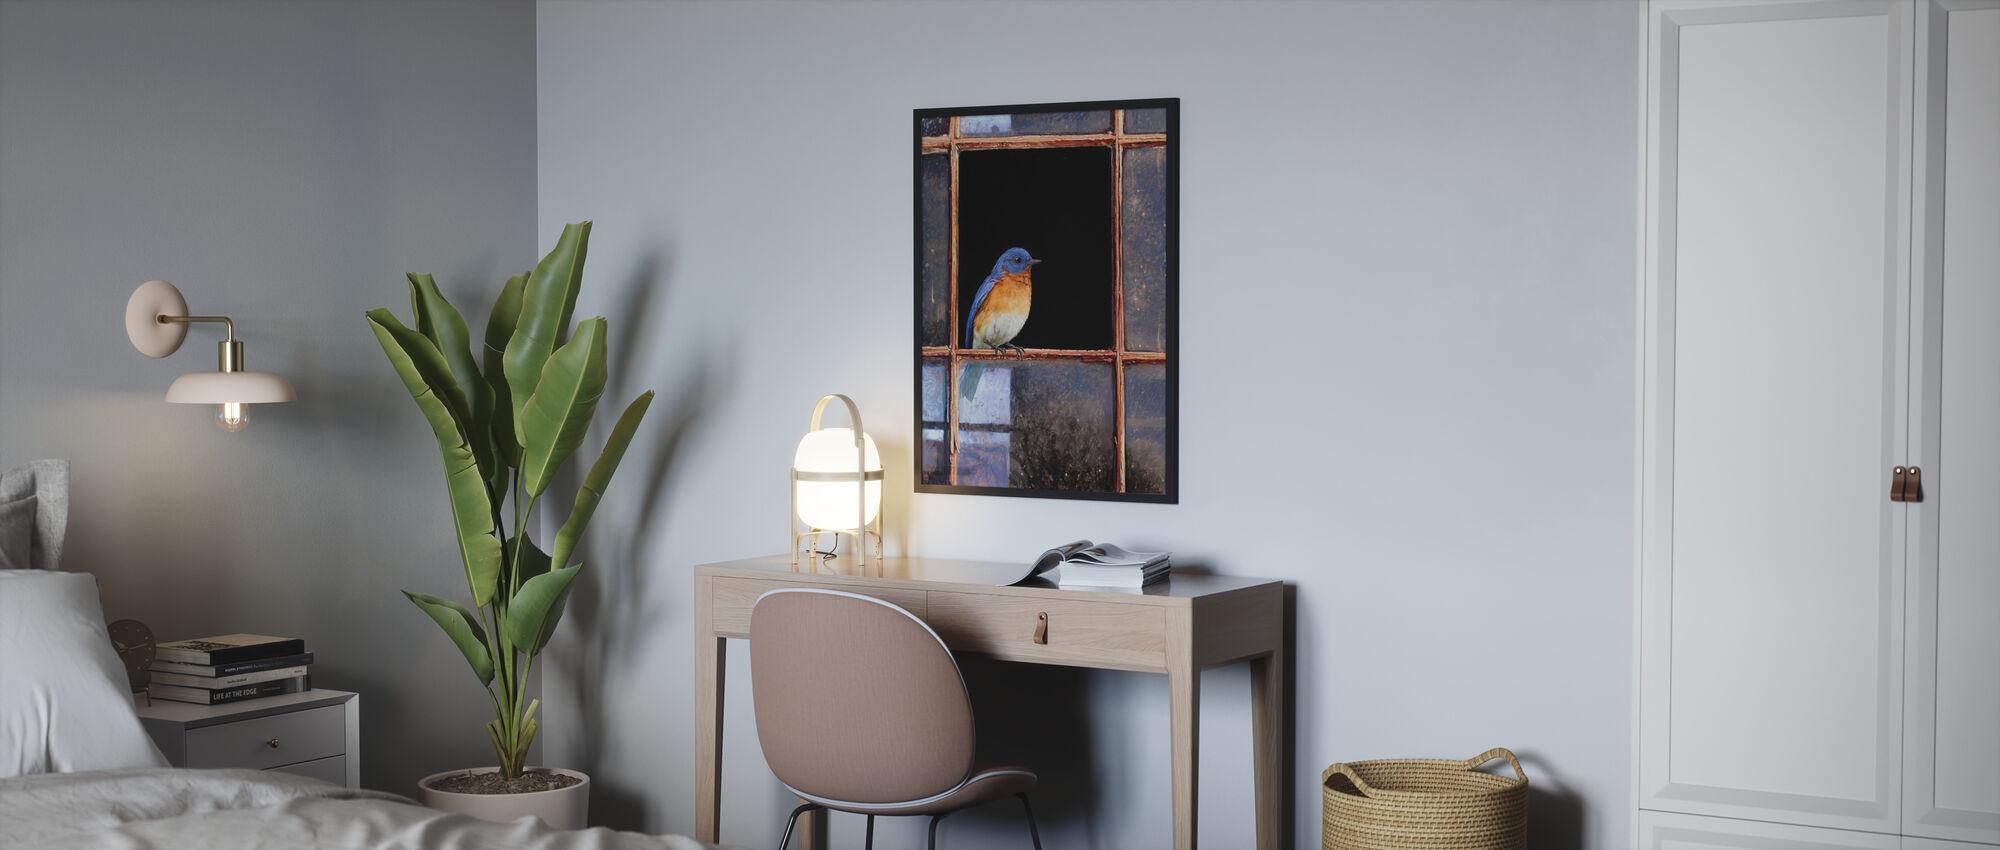 Bluebird-fönster - Inramad tavla - Sovrum